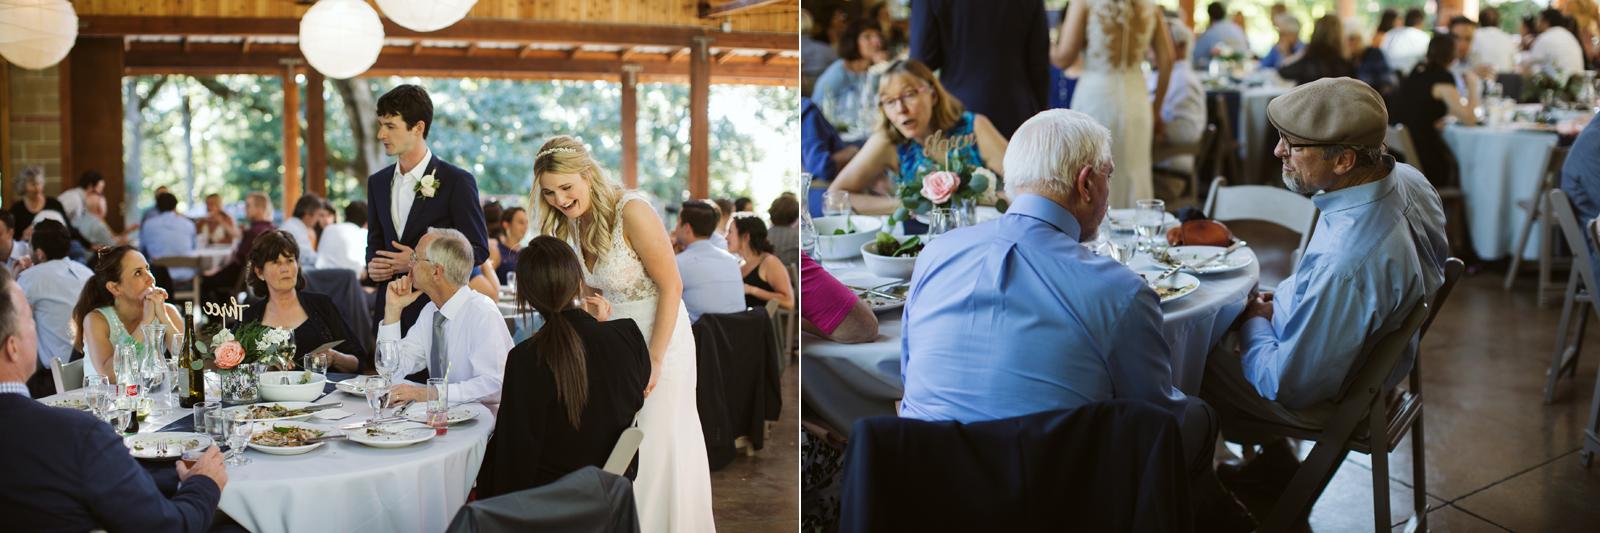 091-daronjackson-rachel-michael-wedding-mtpisgah.jpg